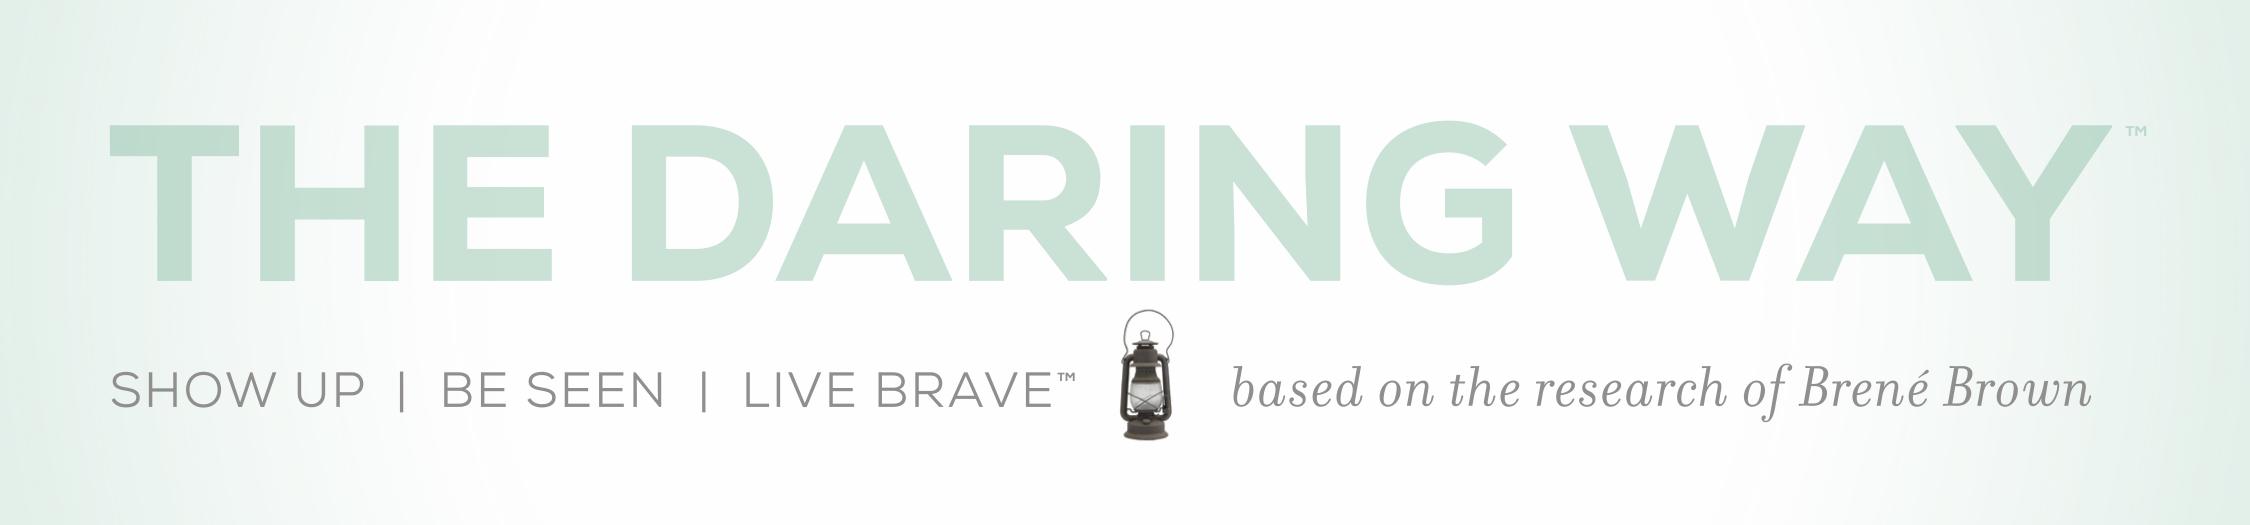 Daring Way™ Banner